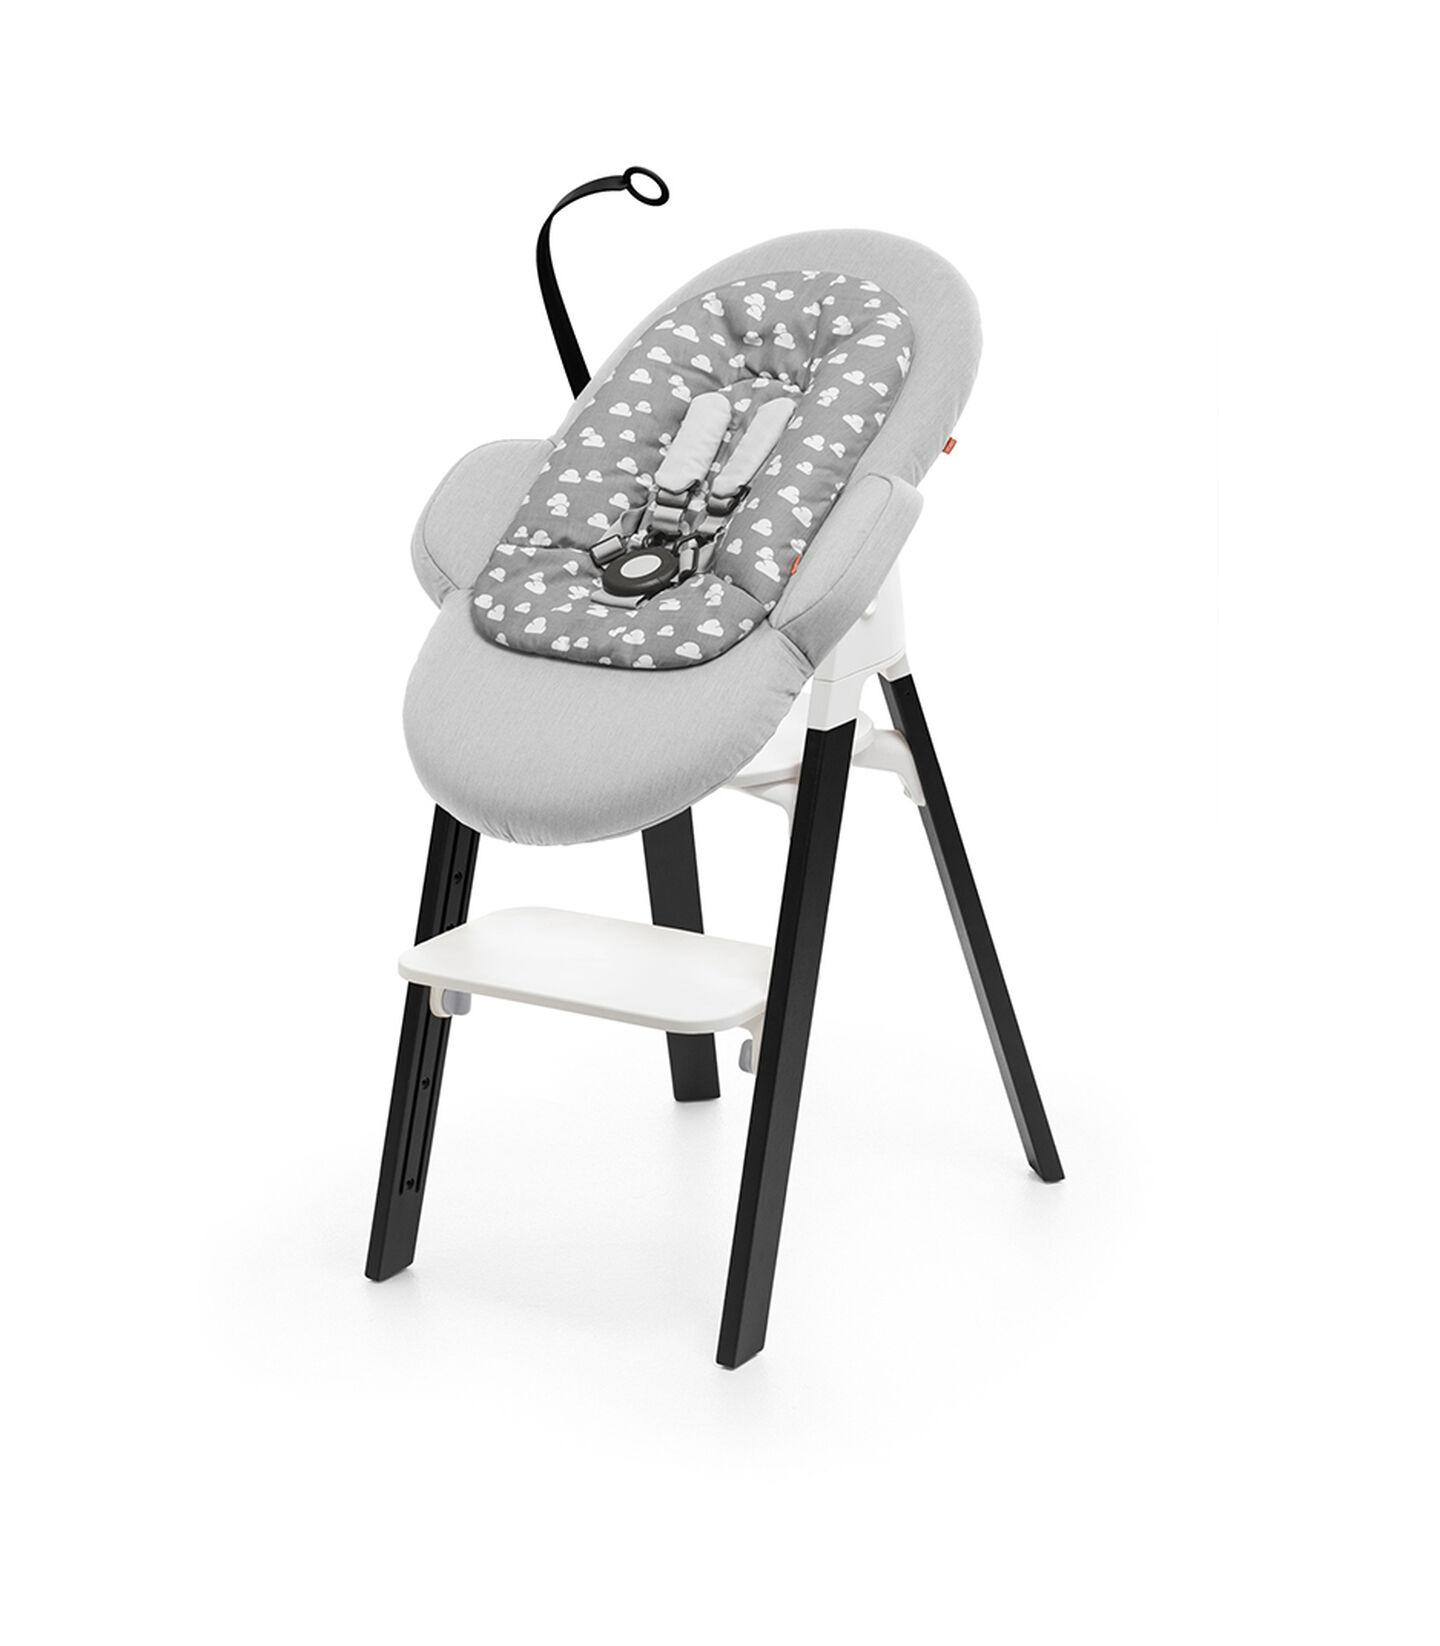 Stokke® Steps™ Chair Oak Black and Stokke® Steps™ Bouncer with Newborn Insert, Grey.